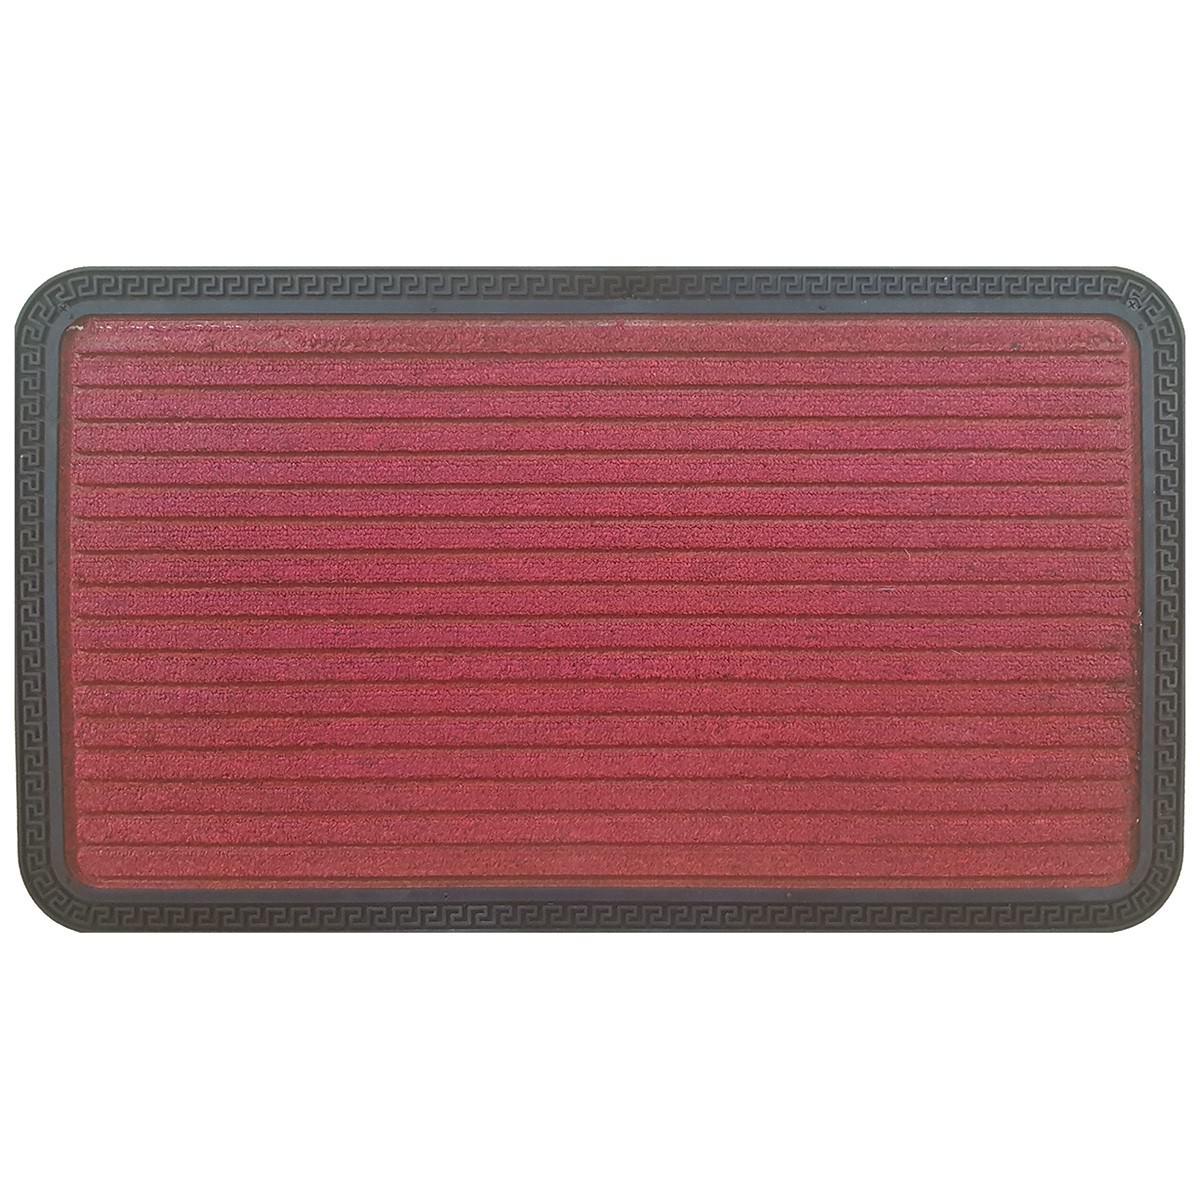 Senart Stripe Rubber Edged Doormat, 70x40cm, Red